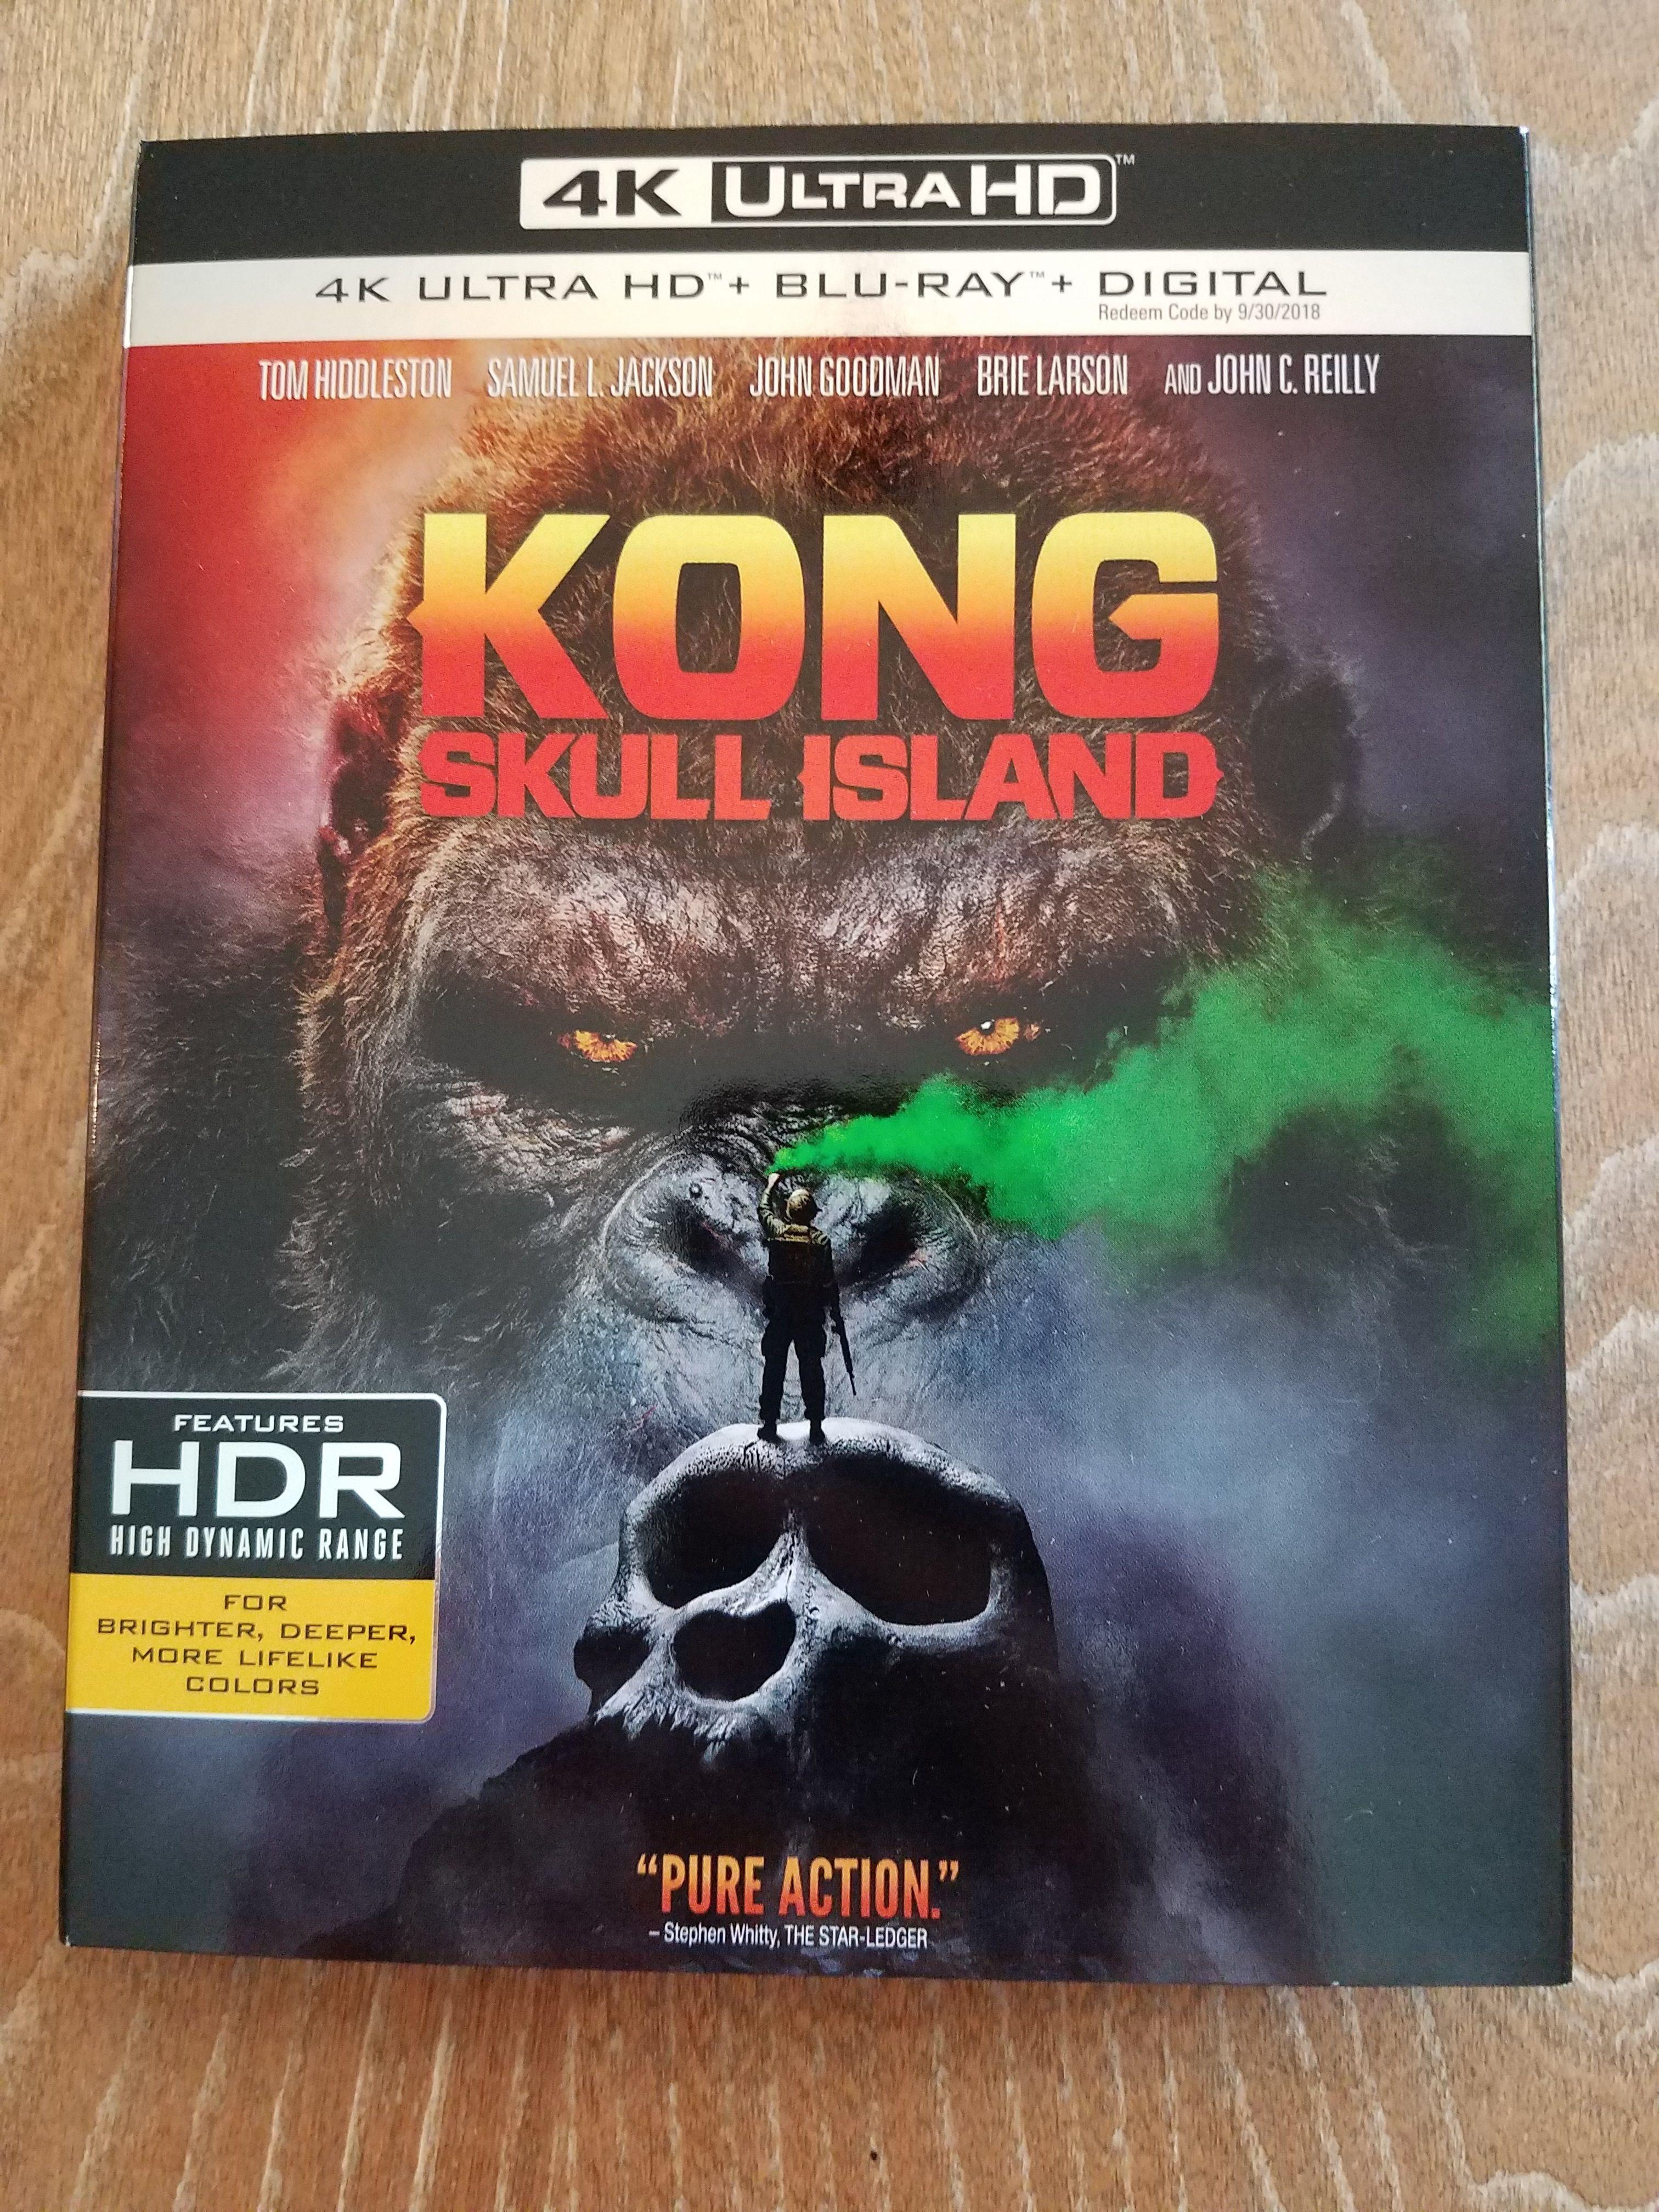 Kong Skull Island 4k 2017 Uhd Ultra Hd Blu Ray Pre Orders Just Came In Http Www Hdmoviesource Com Kong Skull Island Skull Island Kong Legendary Pictures